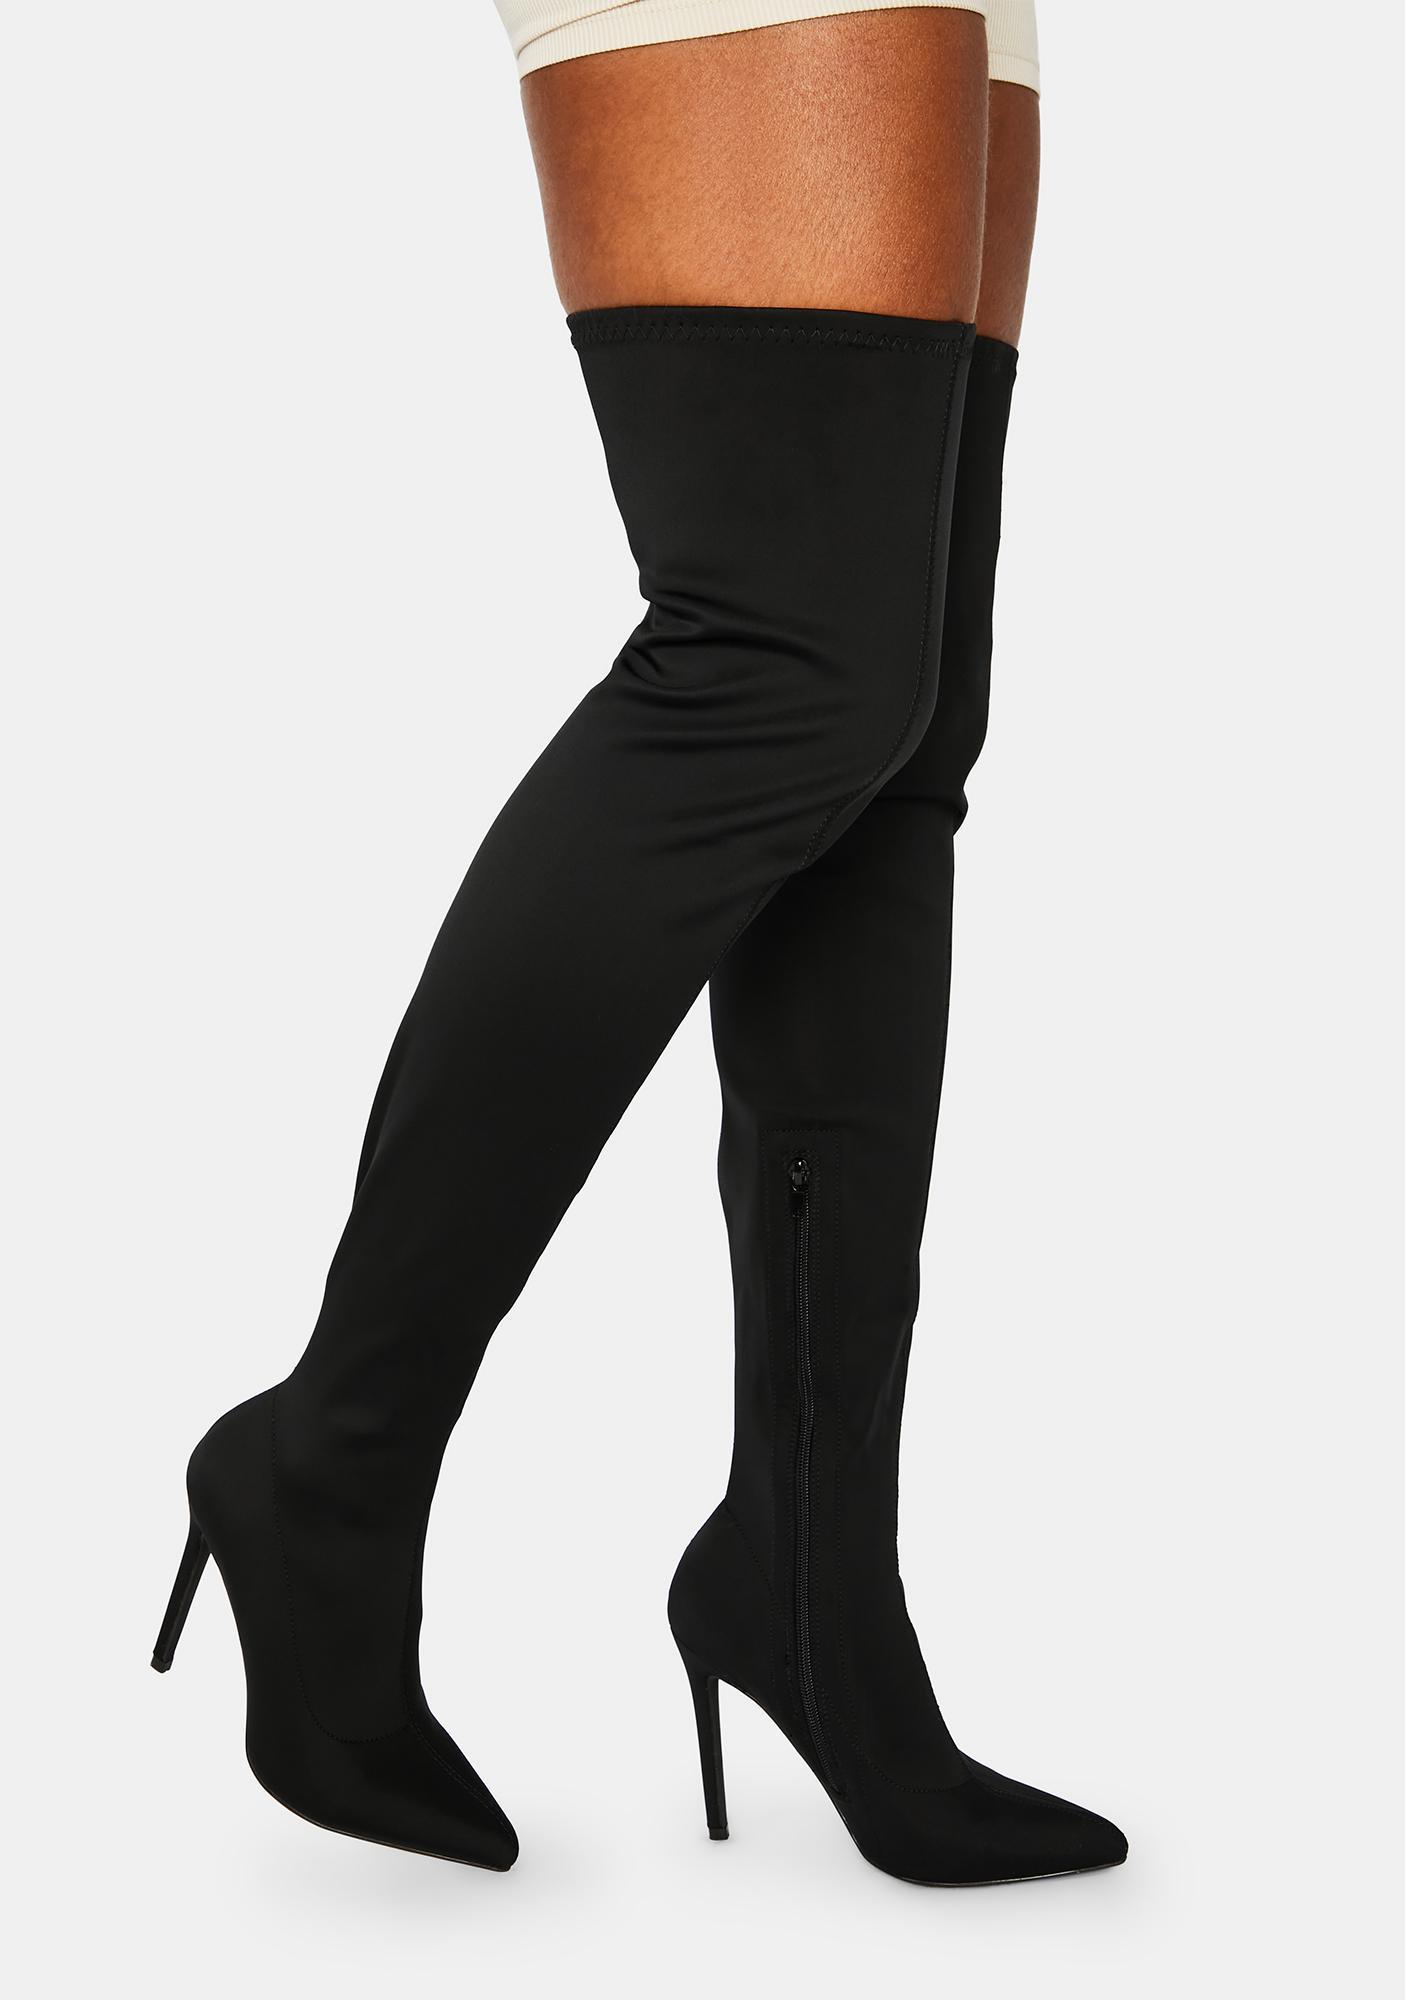 Off Duty Diva Thigh High Boots